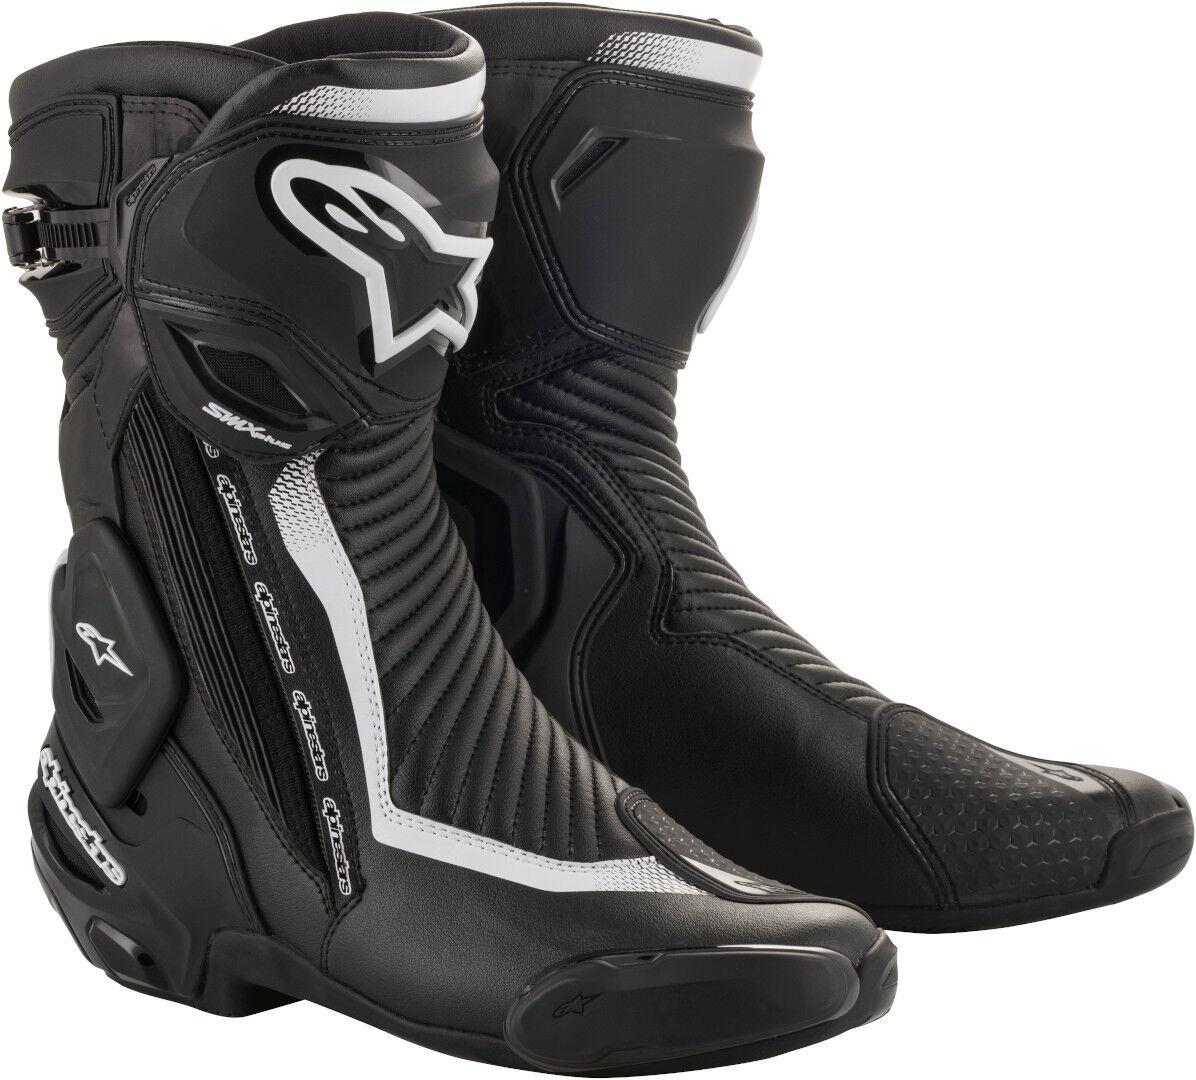 Alpinestars Stella SMX Plus V2 Ladies Motorcycle Boots Black White 39